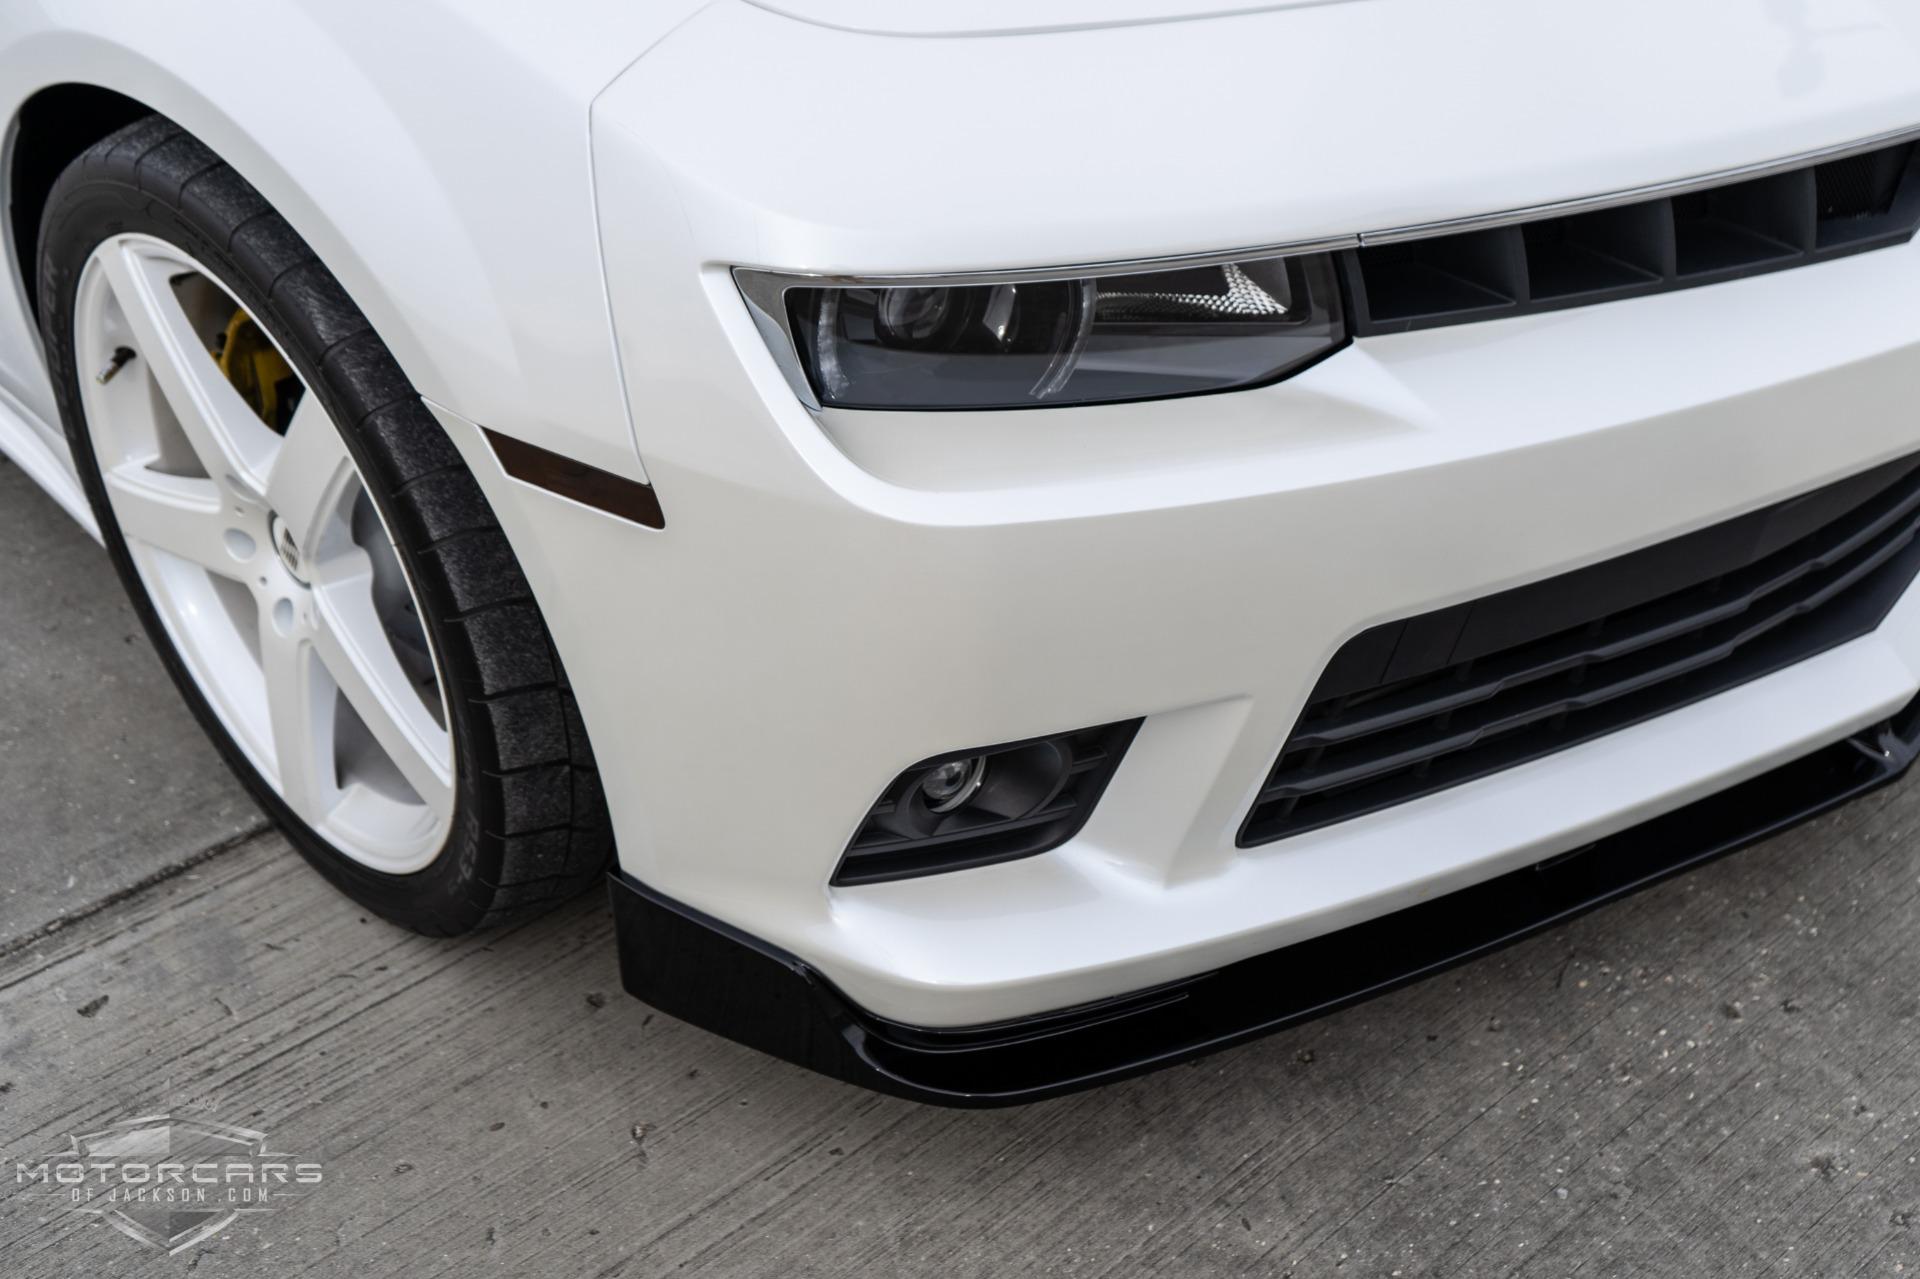 Used-2014-Chevrolet-Camaro-SA30-Saleen-30th-Anniversary-1-of-10-Jackson-MS